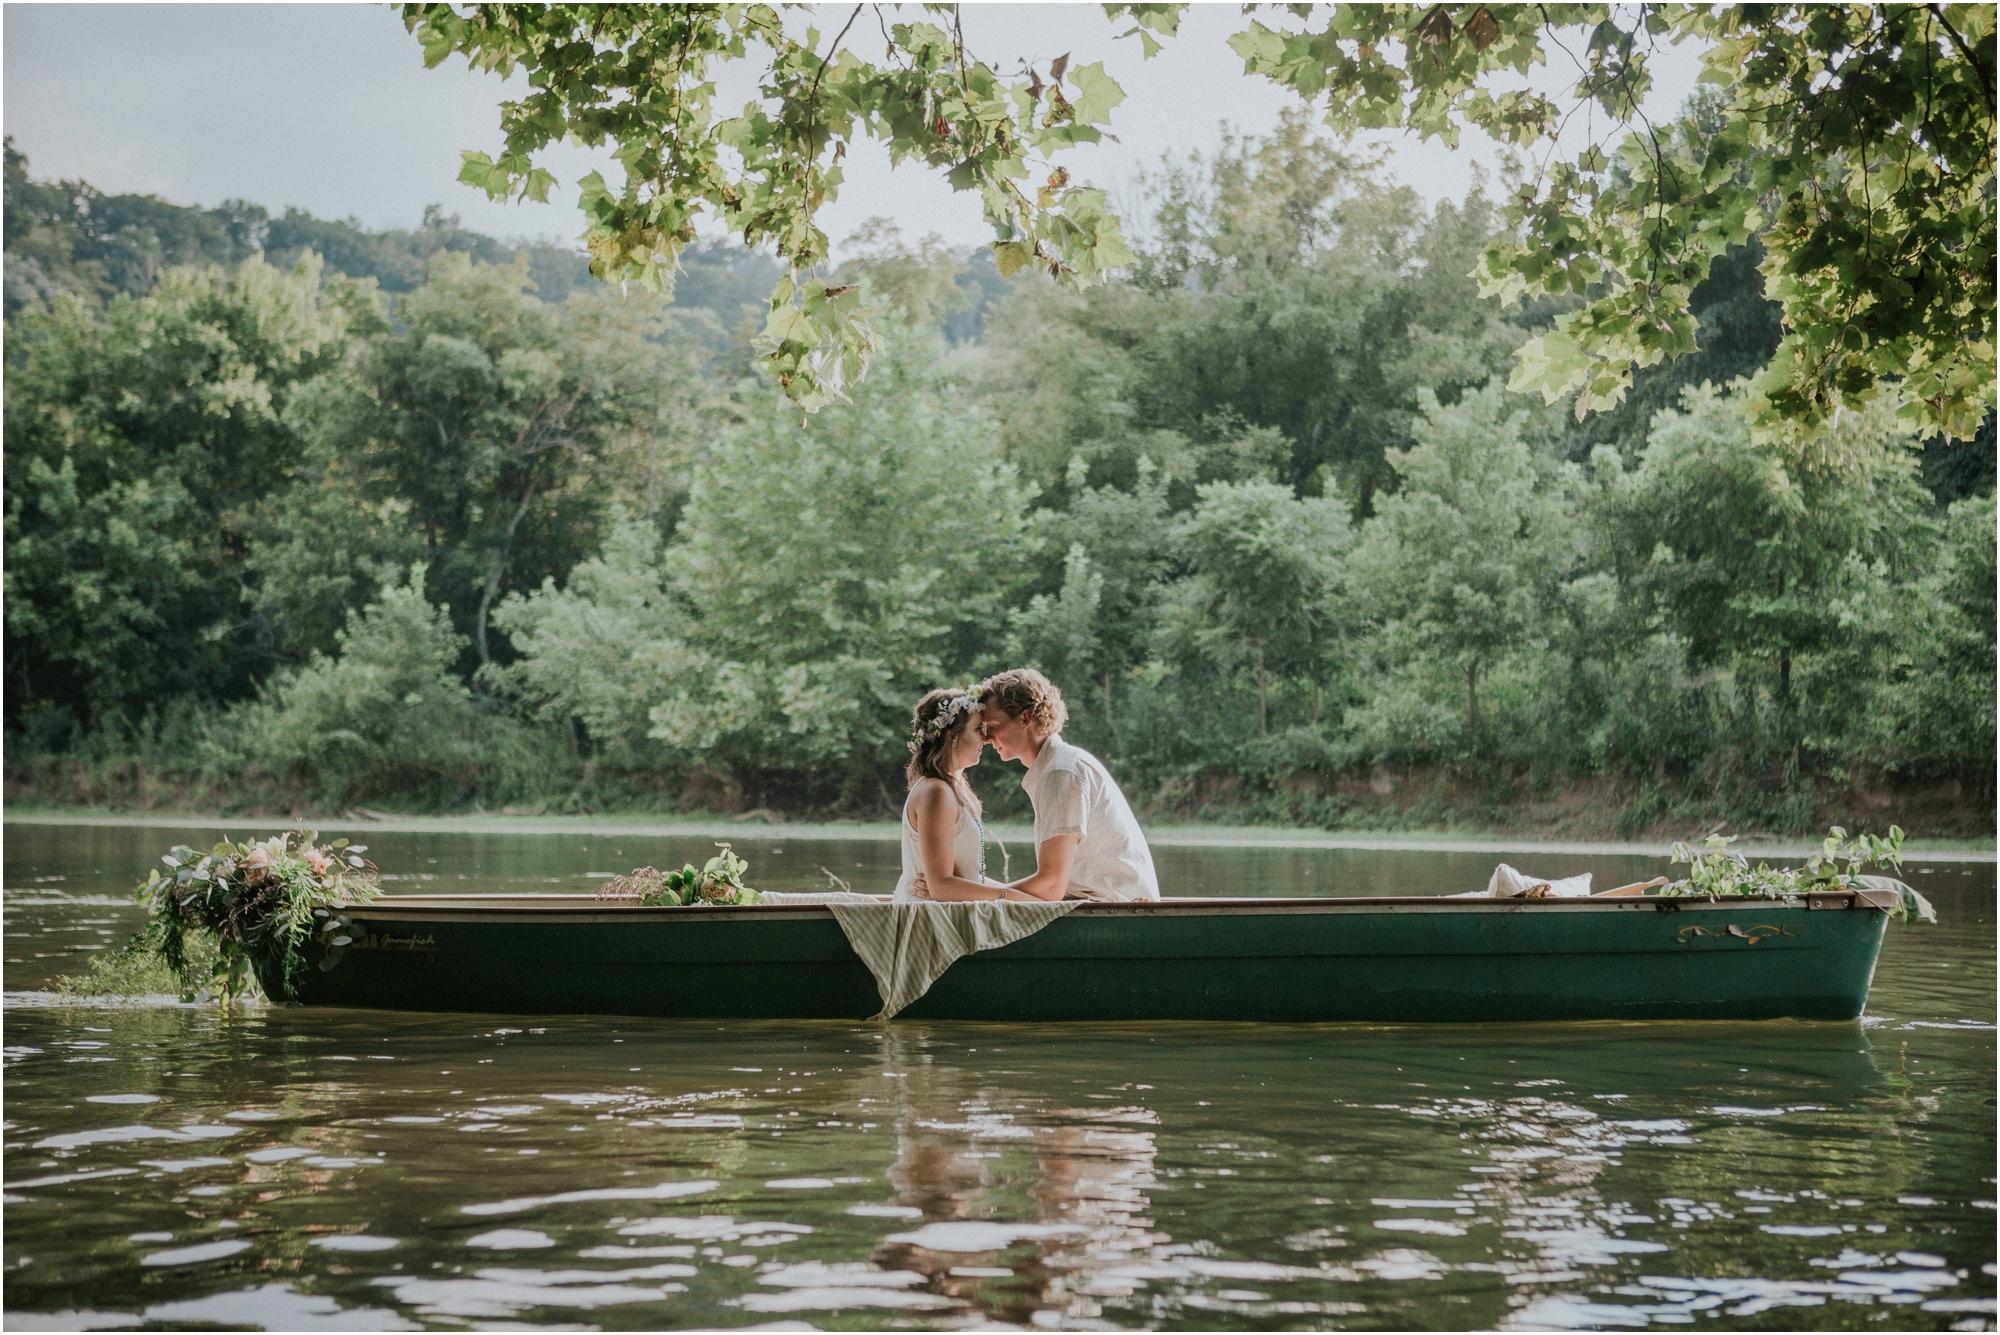 homestead-on-the-holston-hiltons-virginia-bohemian-canoe-styled-shoot-northeast-tennessee-elopement-wild-free-spirit_0011.jpg